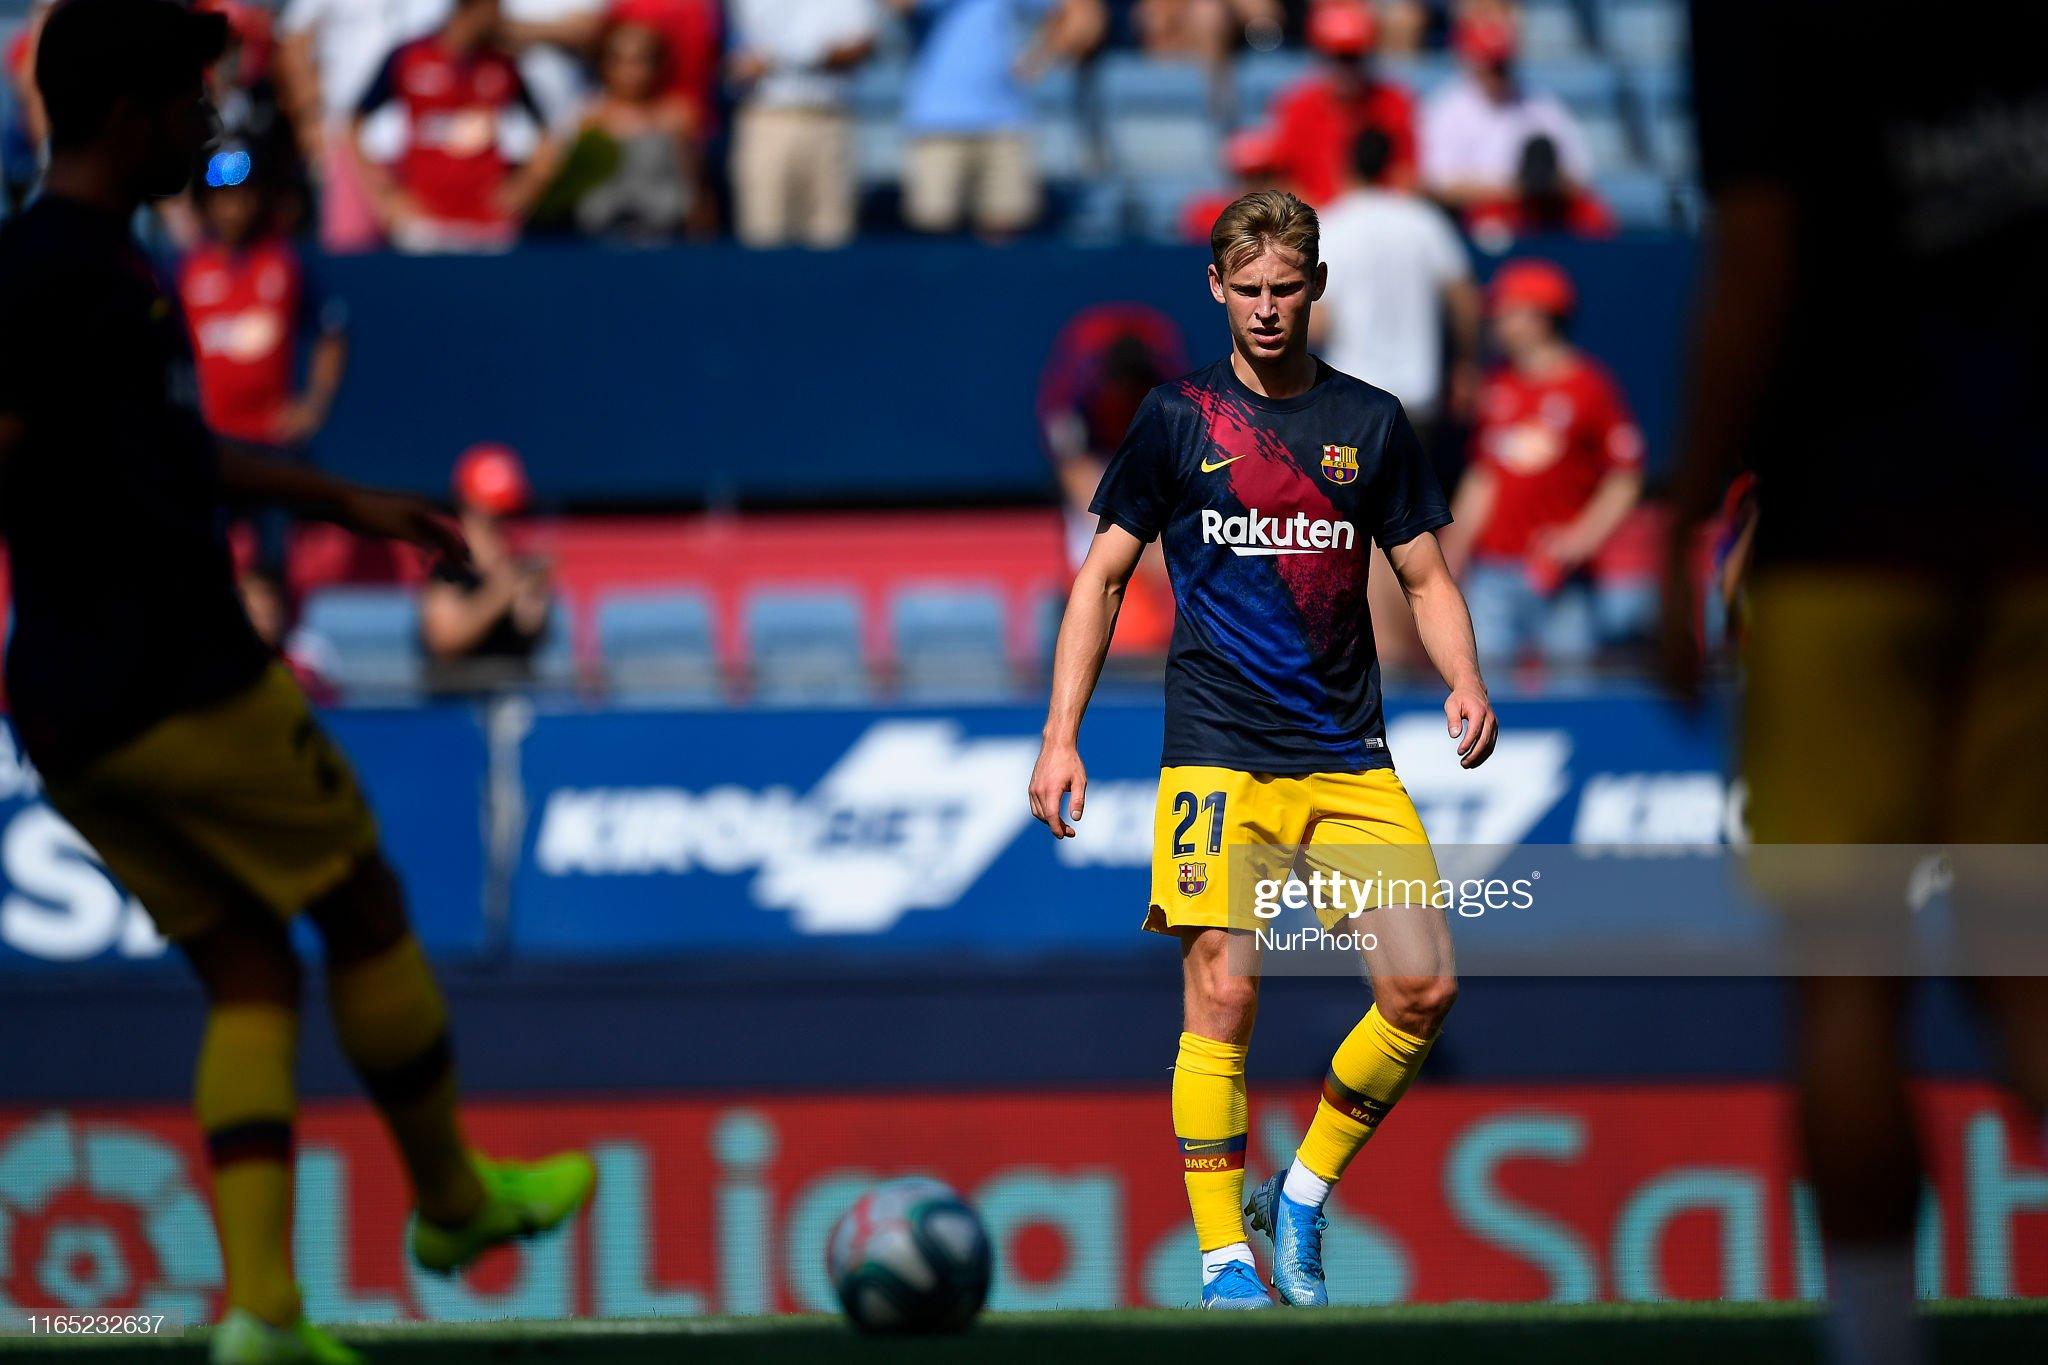 صور مباراة : أوساسونا - برشلونة 2-2 ( 31-08-2019 )  Frenkie-de-jong-of-barcelona-during-the-warmup-before-the-liga-match-picture-id1165232637?s=2048x2048